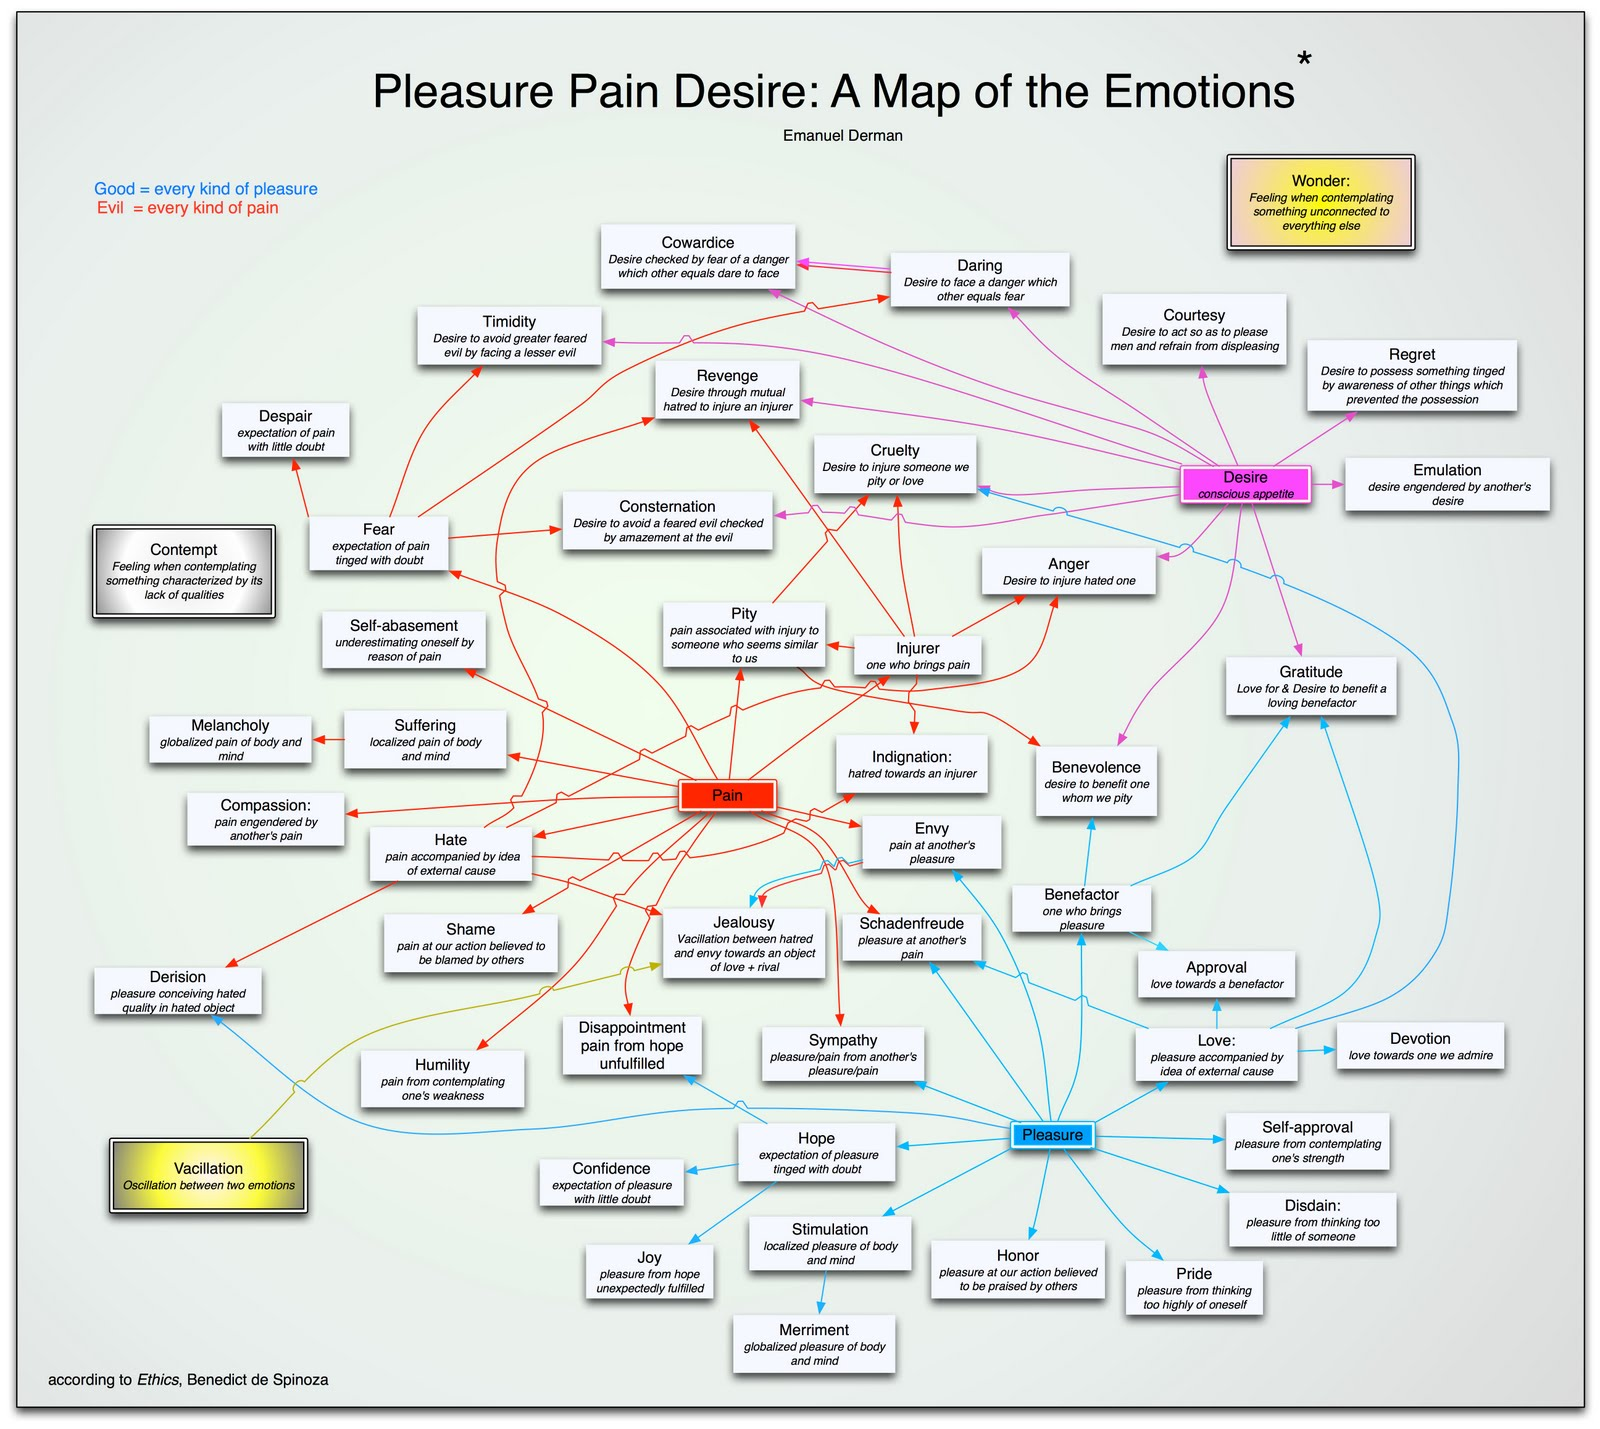 Regret, Pleasure pain desire dread